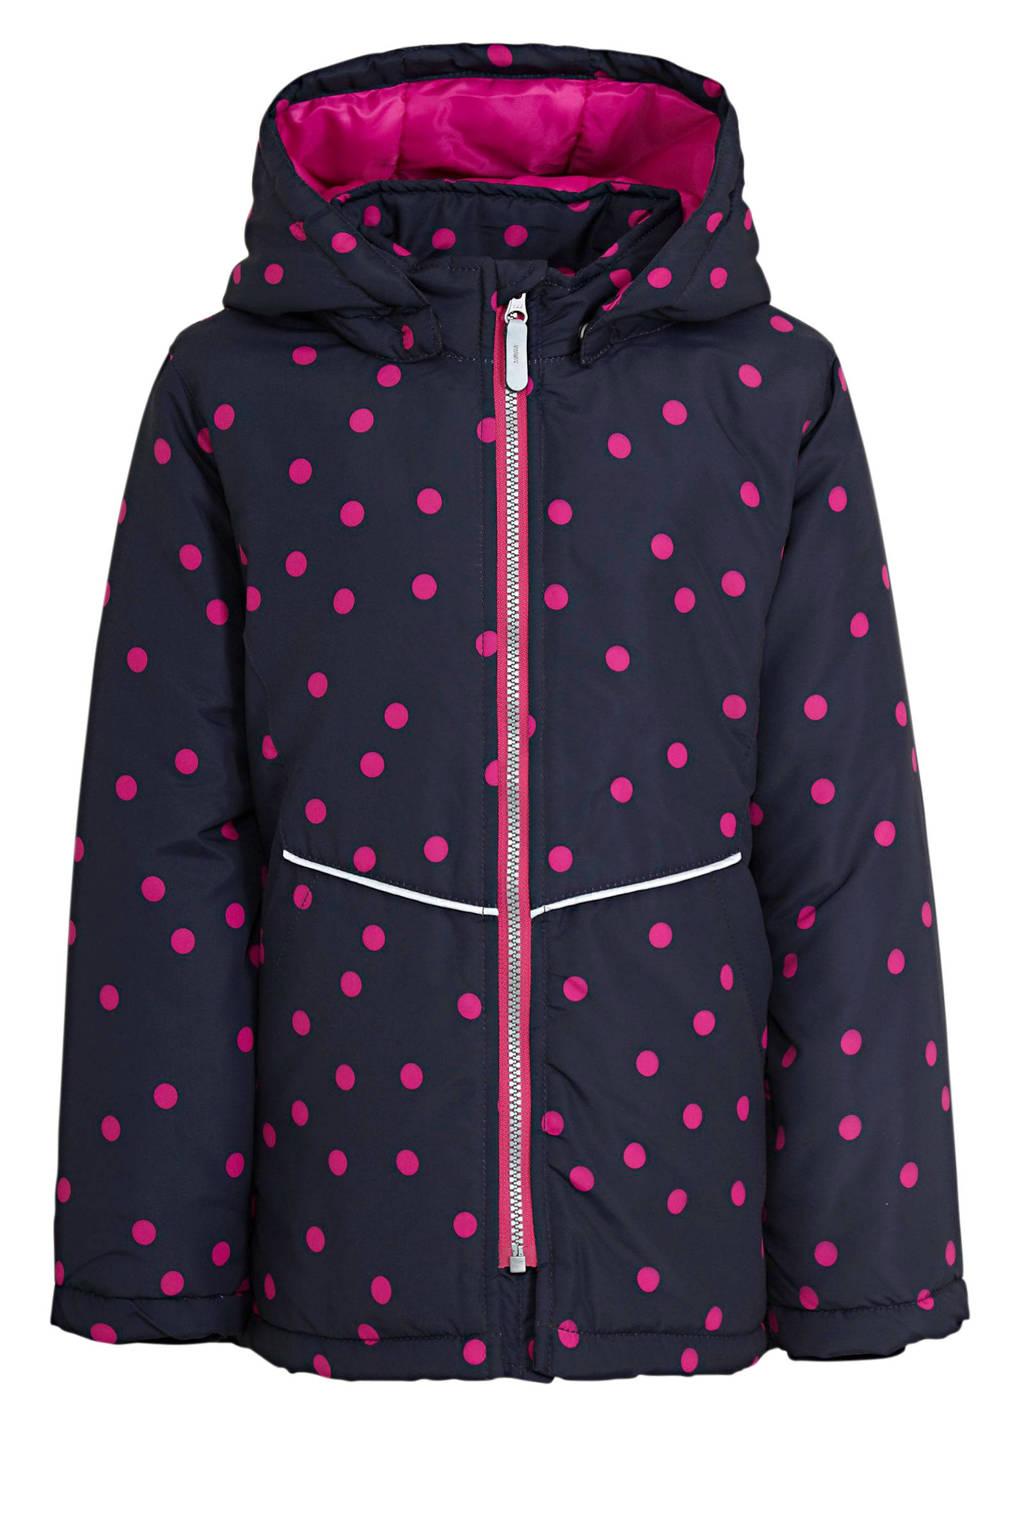 NAME IT KIDS jack winter Maxi met stippen donkerblauw/roze, Donkerblauw/roze